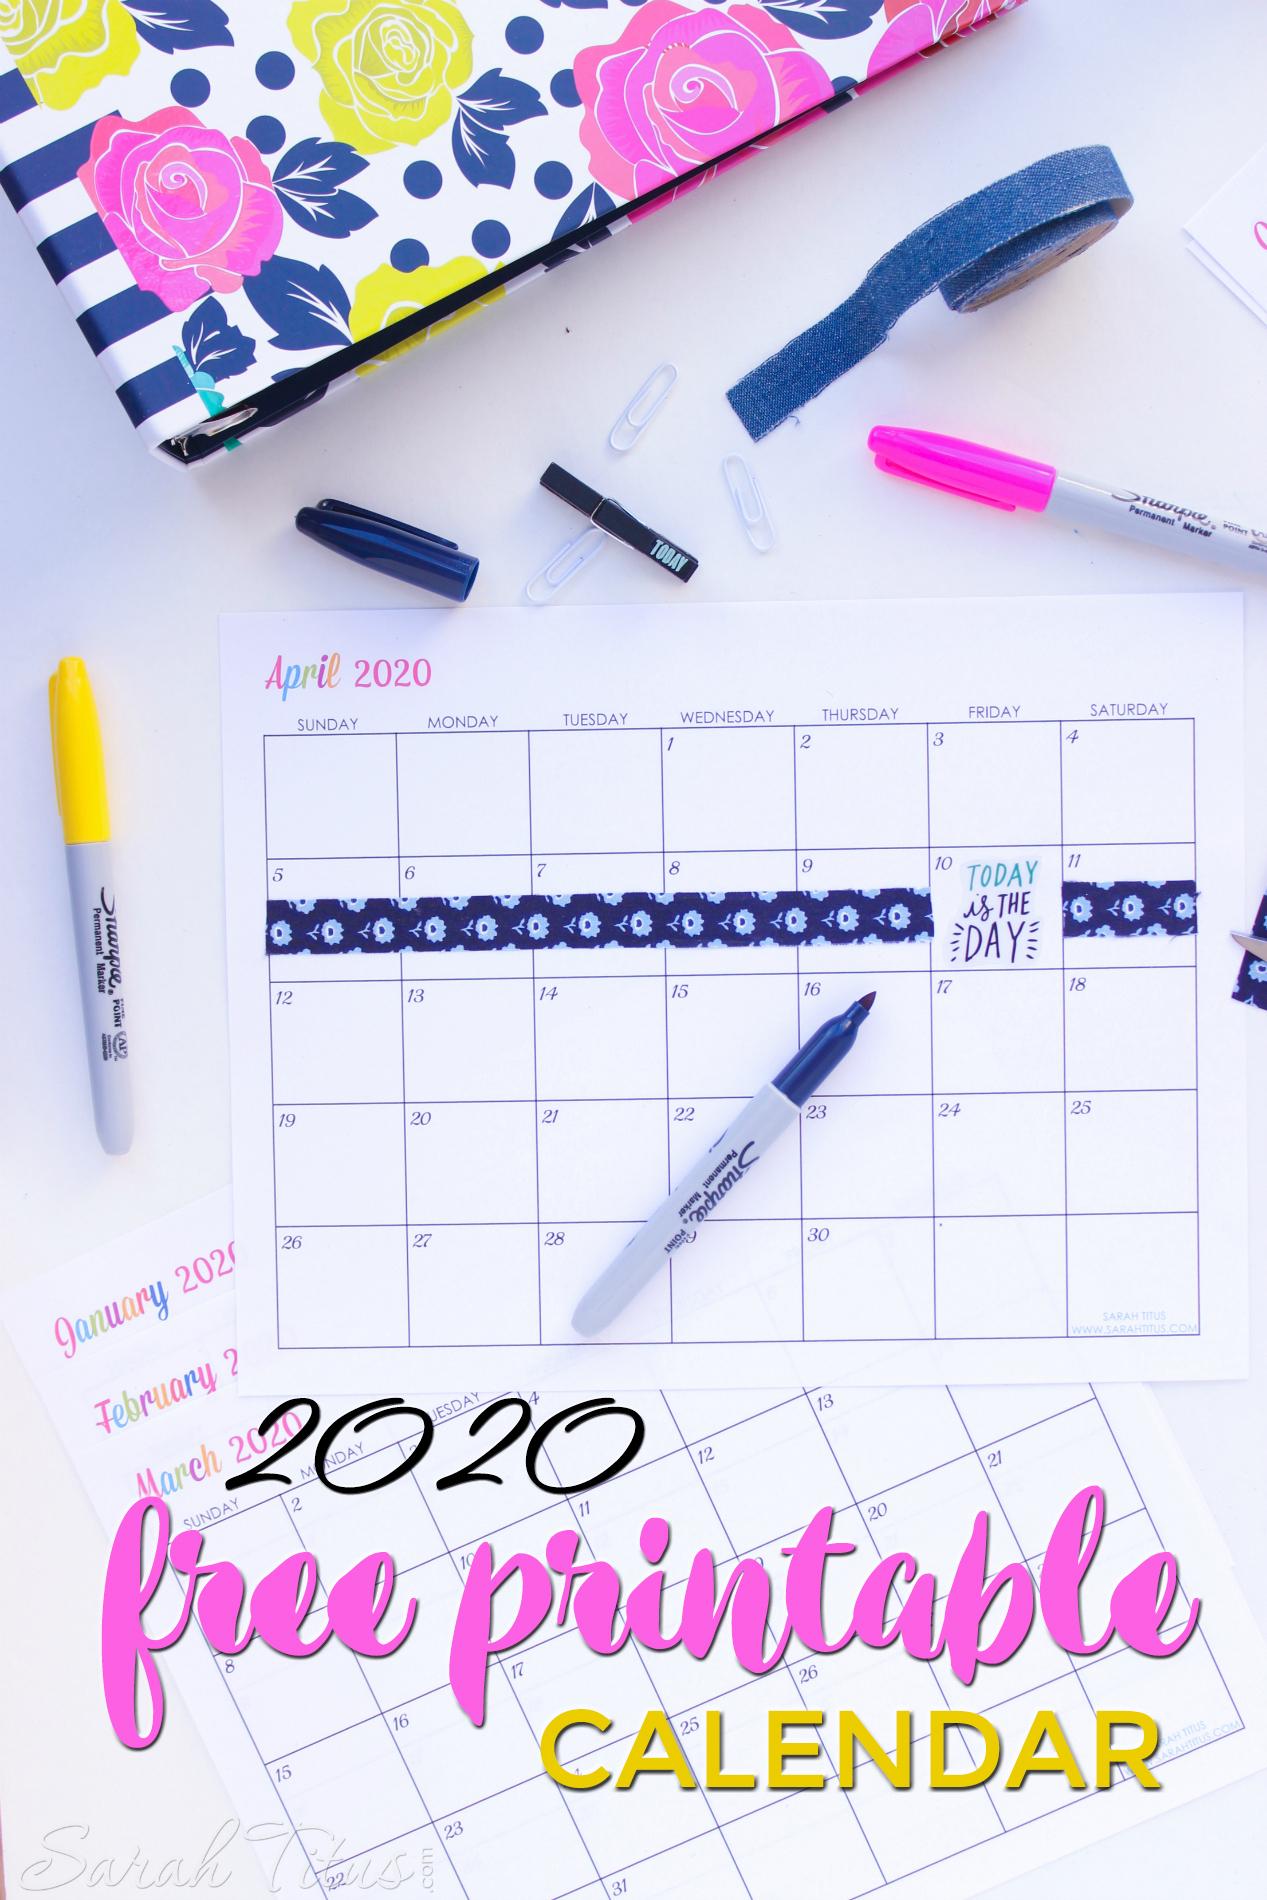 Custom Editable 2020 Free Printable Calendars - Sarah Titus inside 2020 Calendar I Can Edit